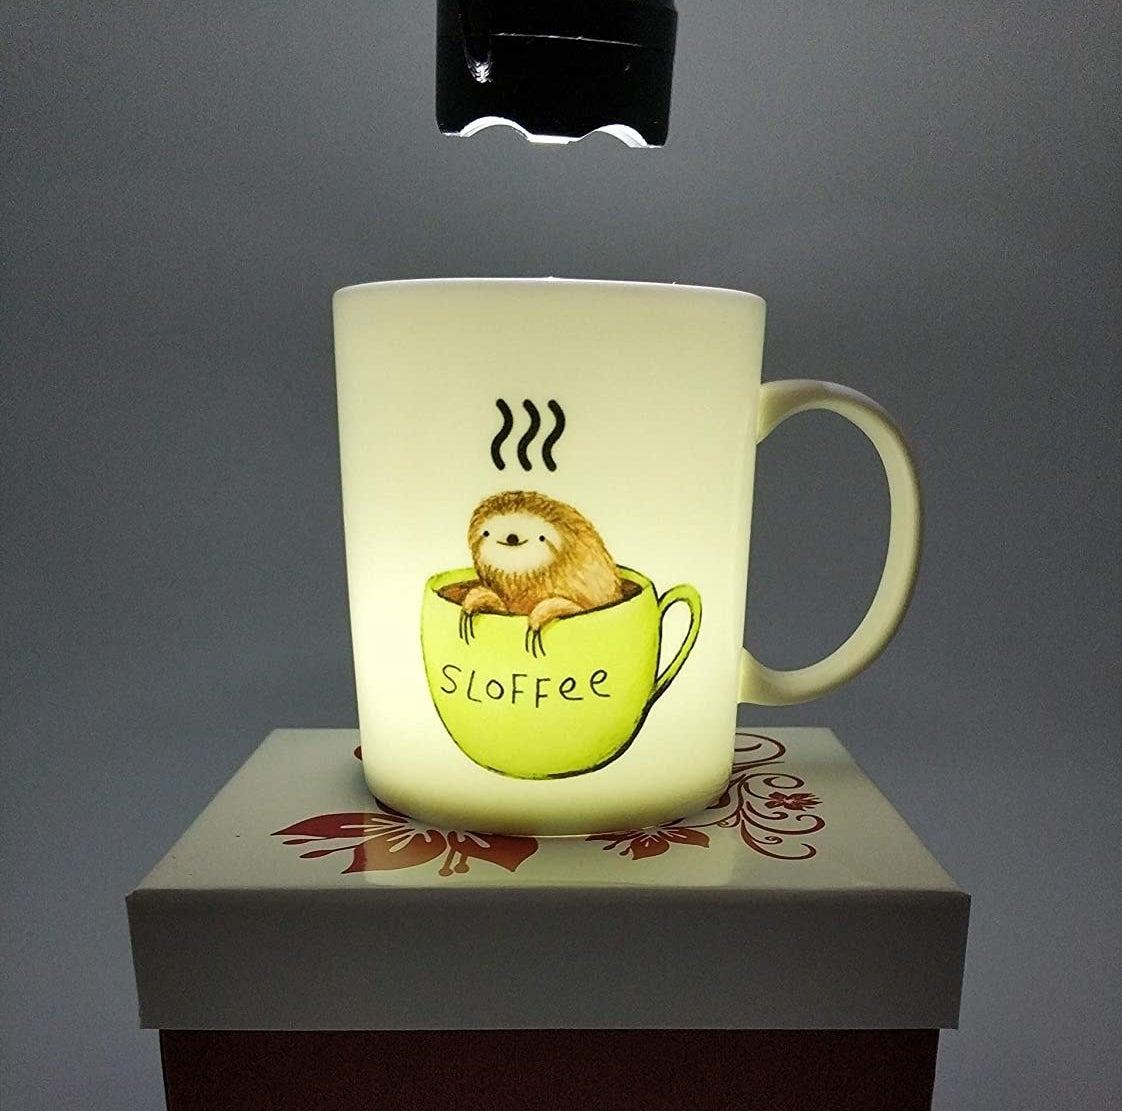 the mug under a lamp